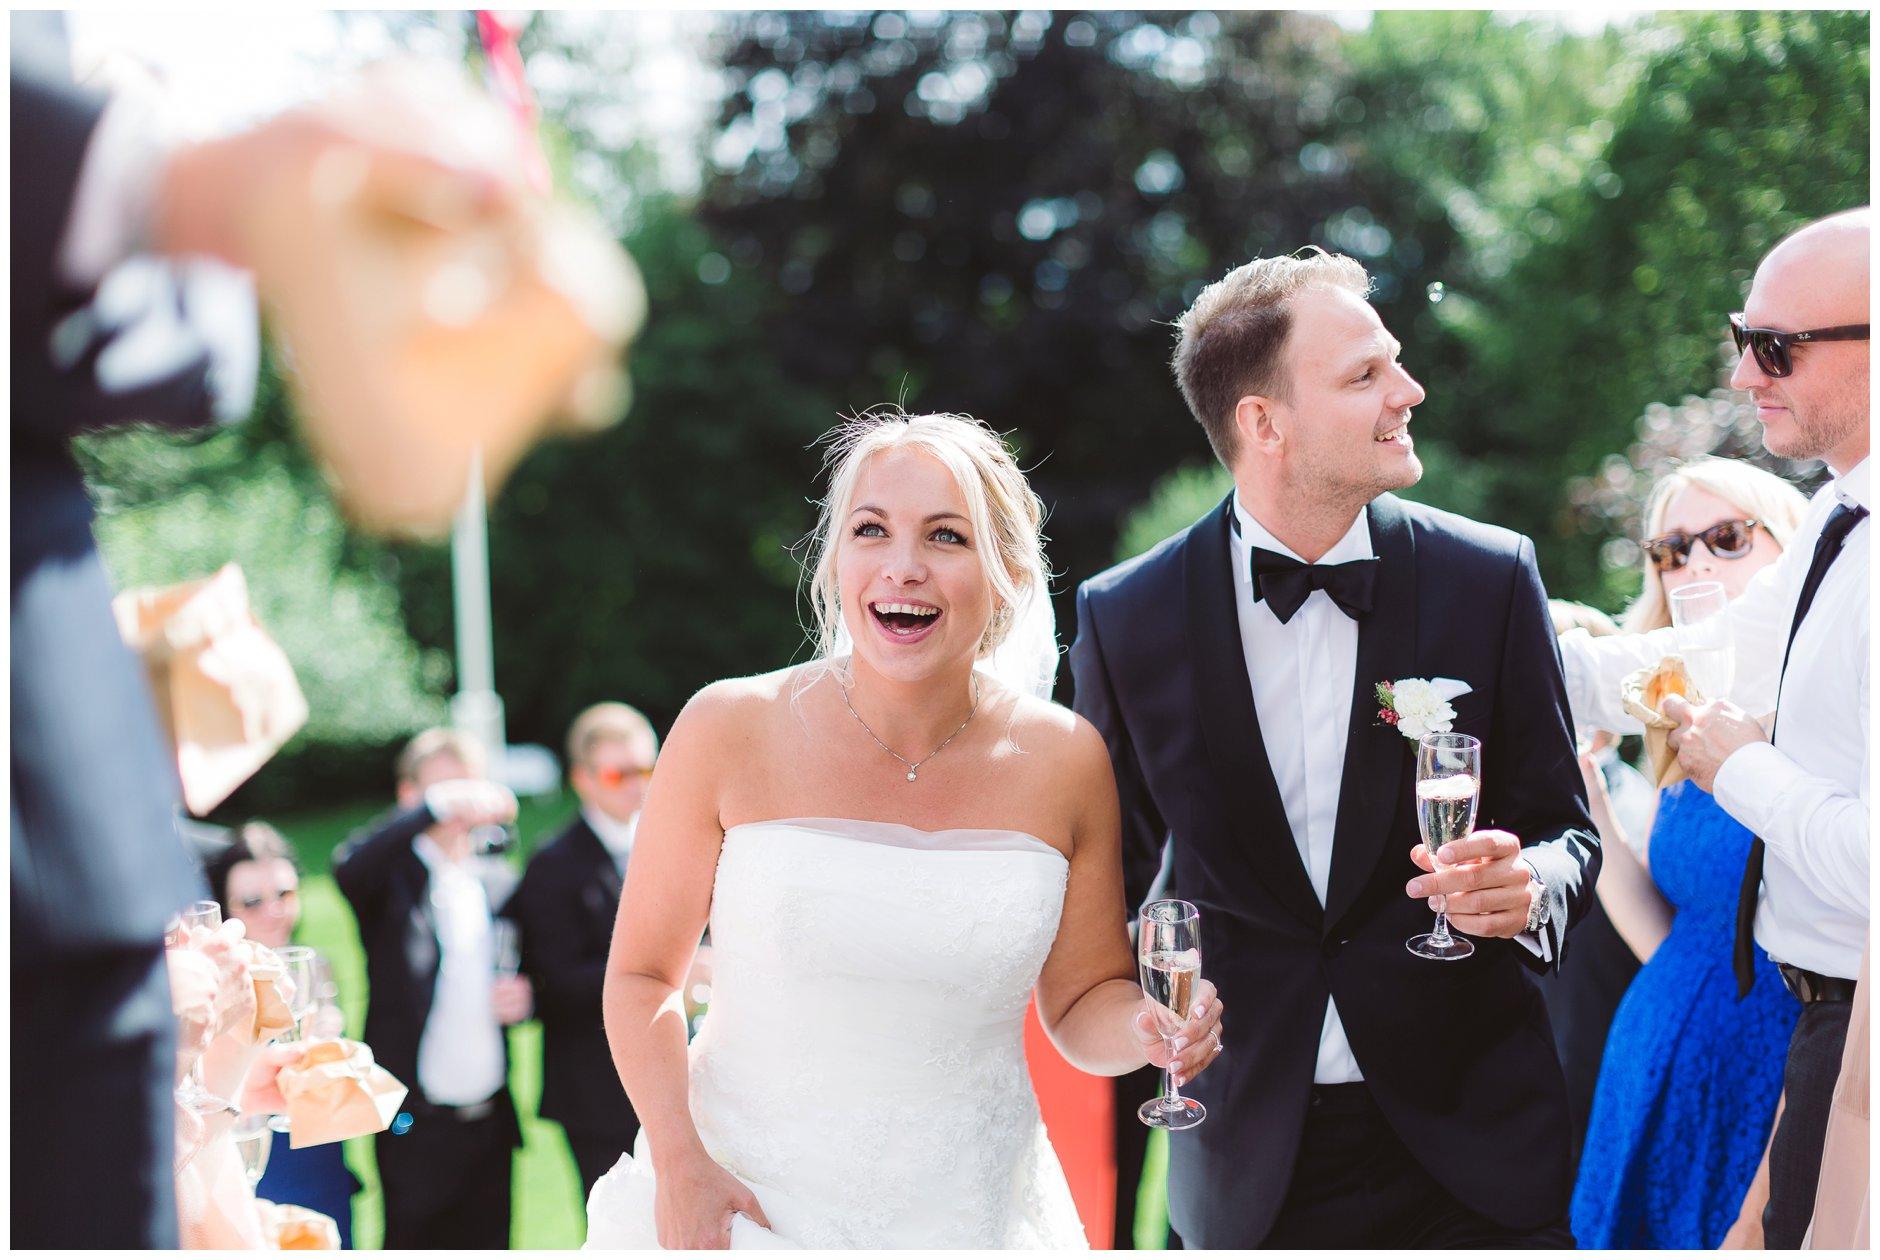 Fagerborg kirke Villa Eckbo bryllup